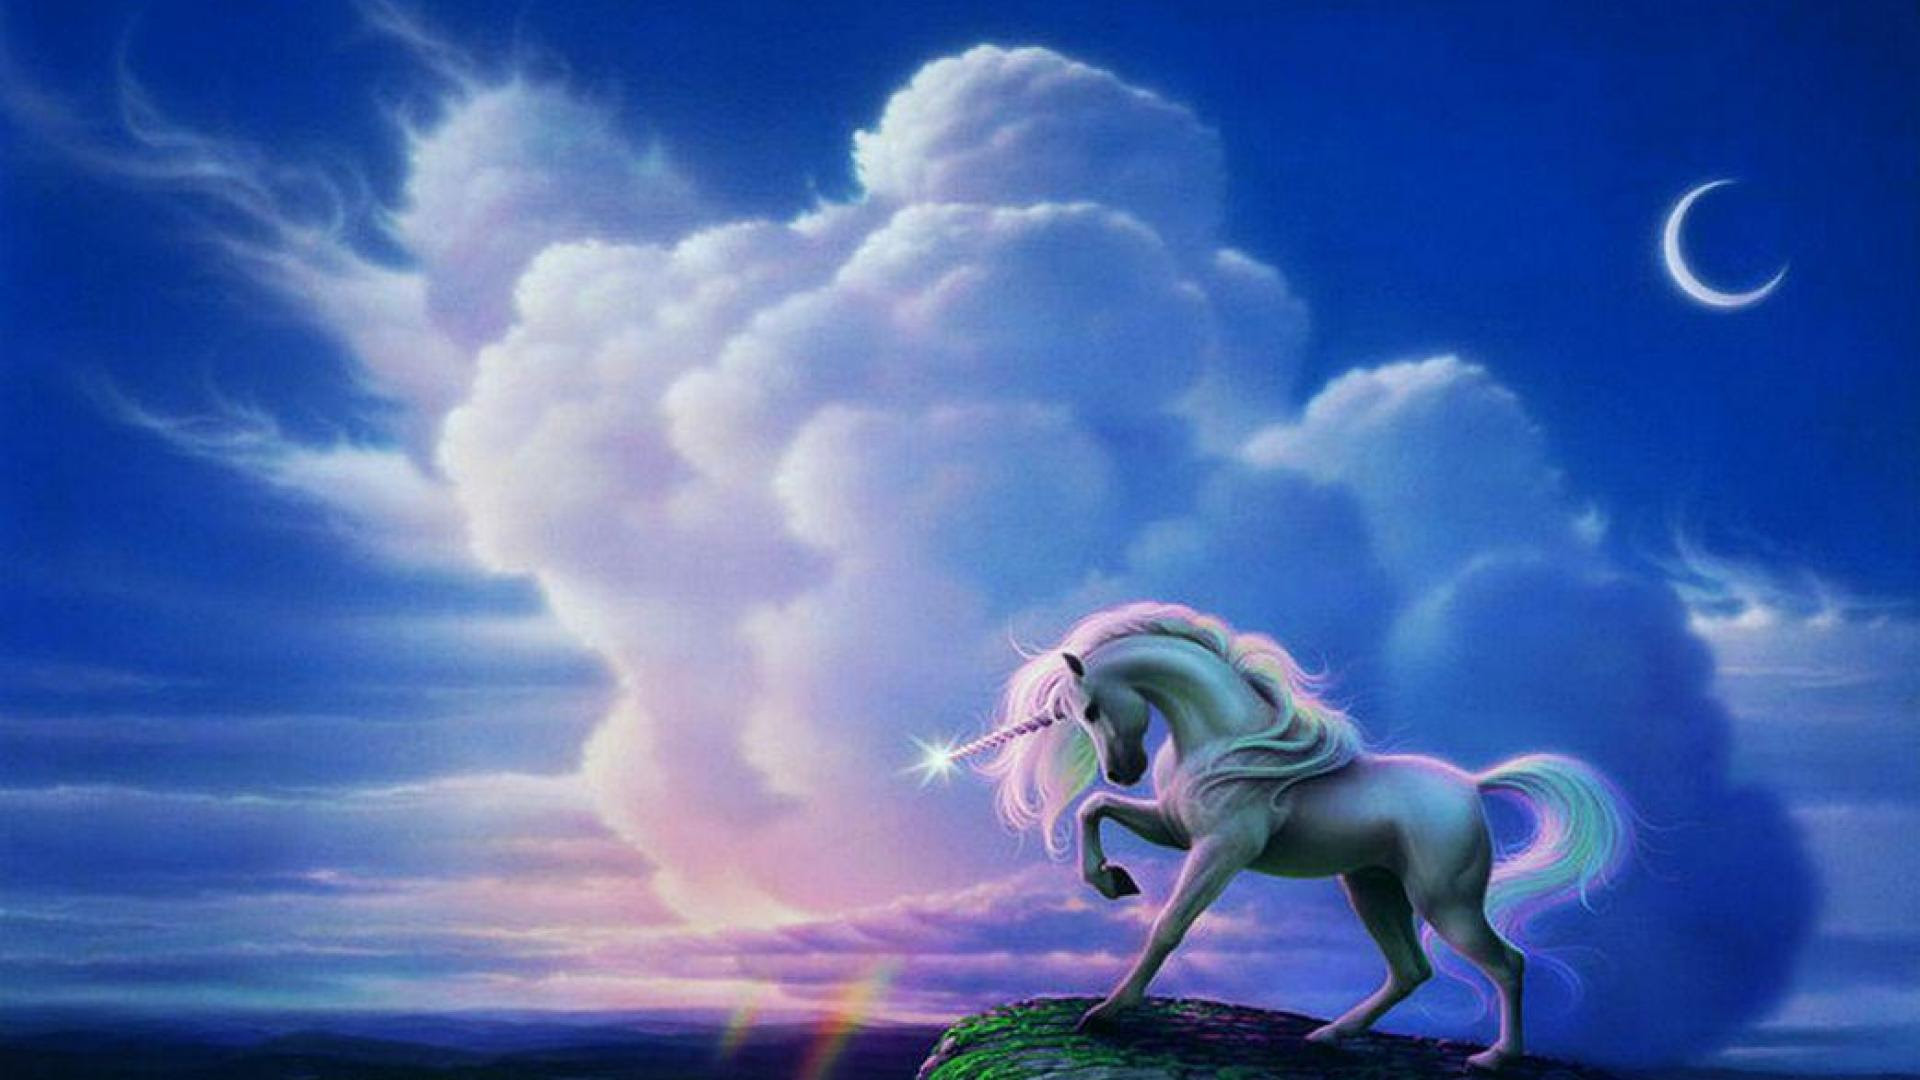 Unicorn 4u Unicorn Wallpapers High Quality Download Free